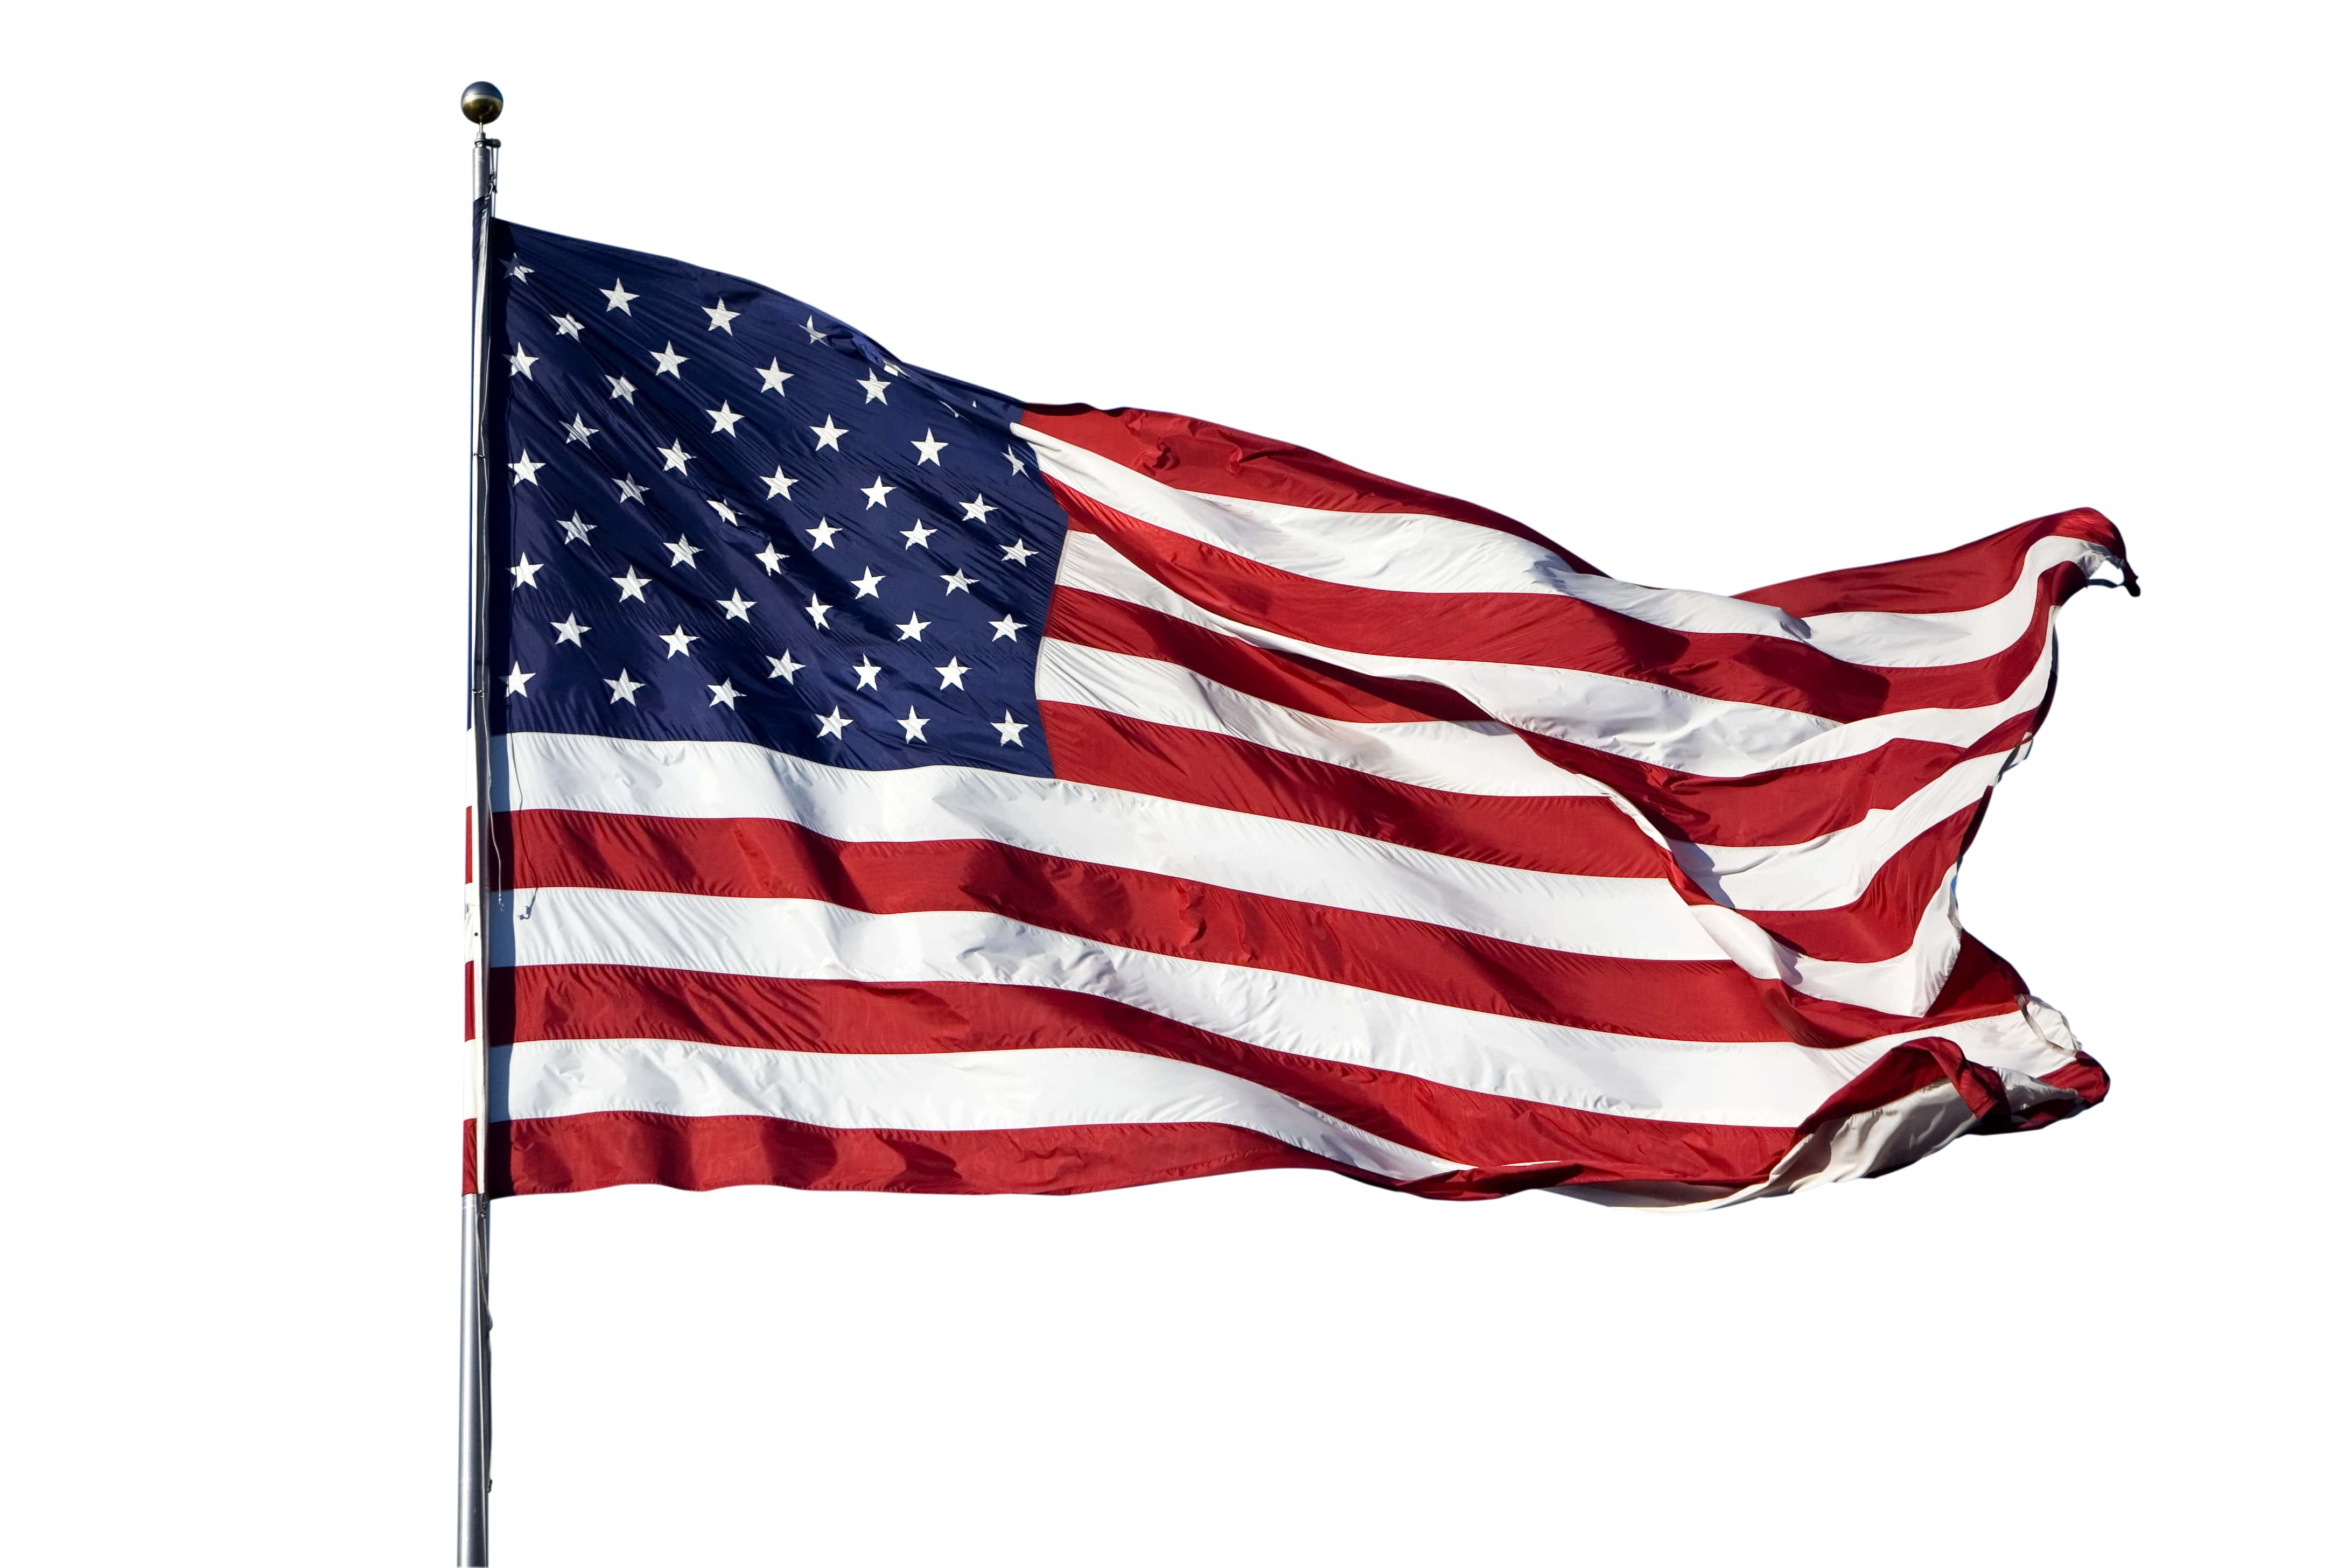 Corrupt States in the U.S